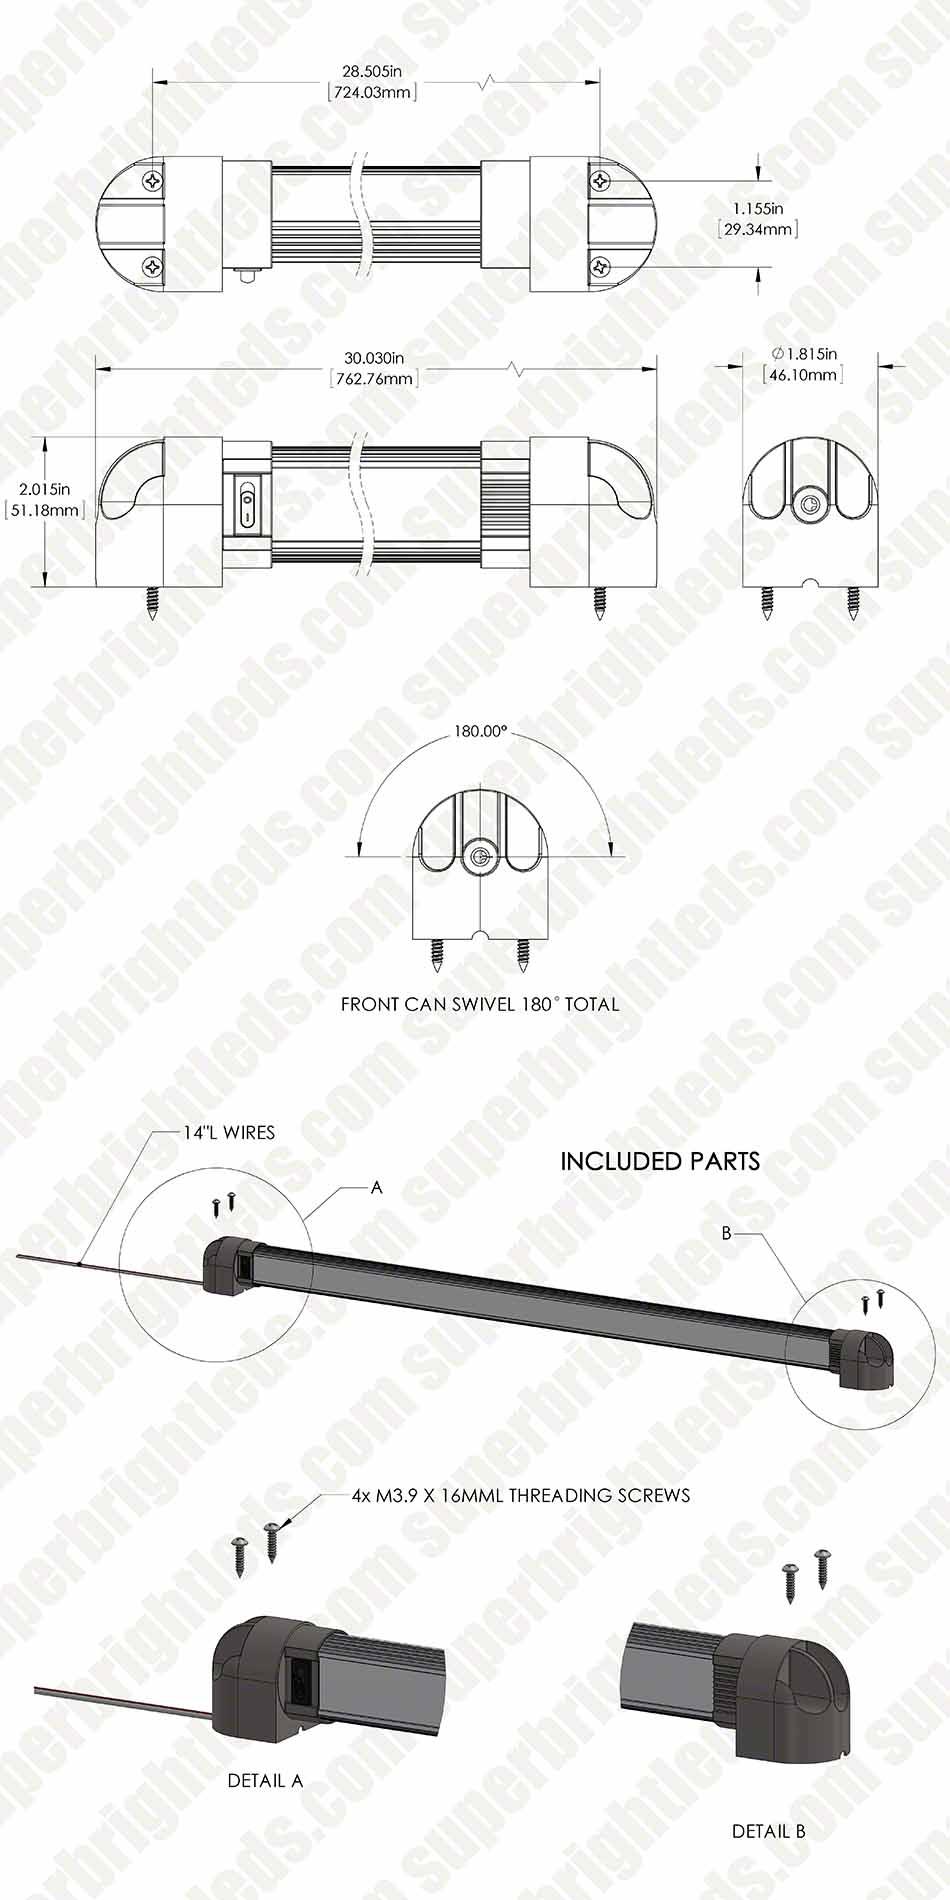 30 Heavy Duty Swivel Led Utility Light Bar W 18 Leds And Rocker 12v Switch Blue All Electronics Corp With